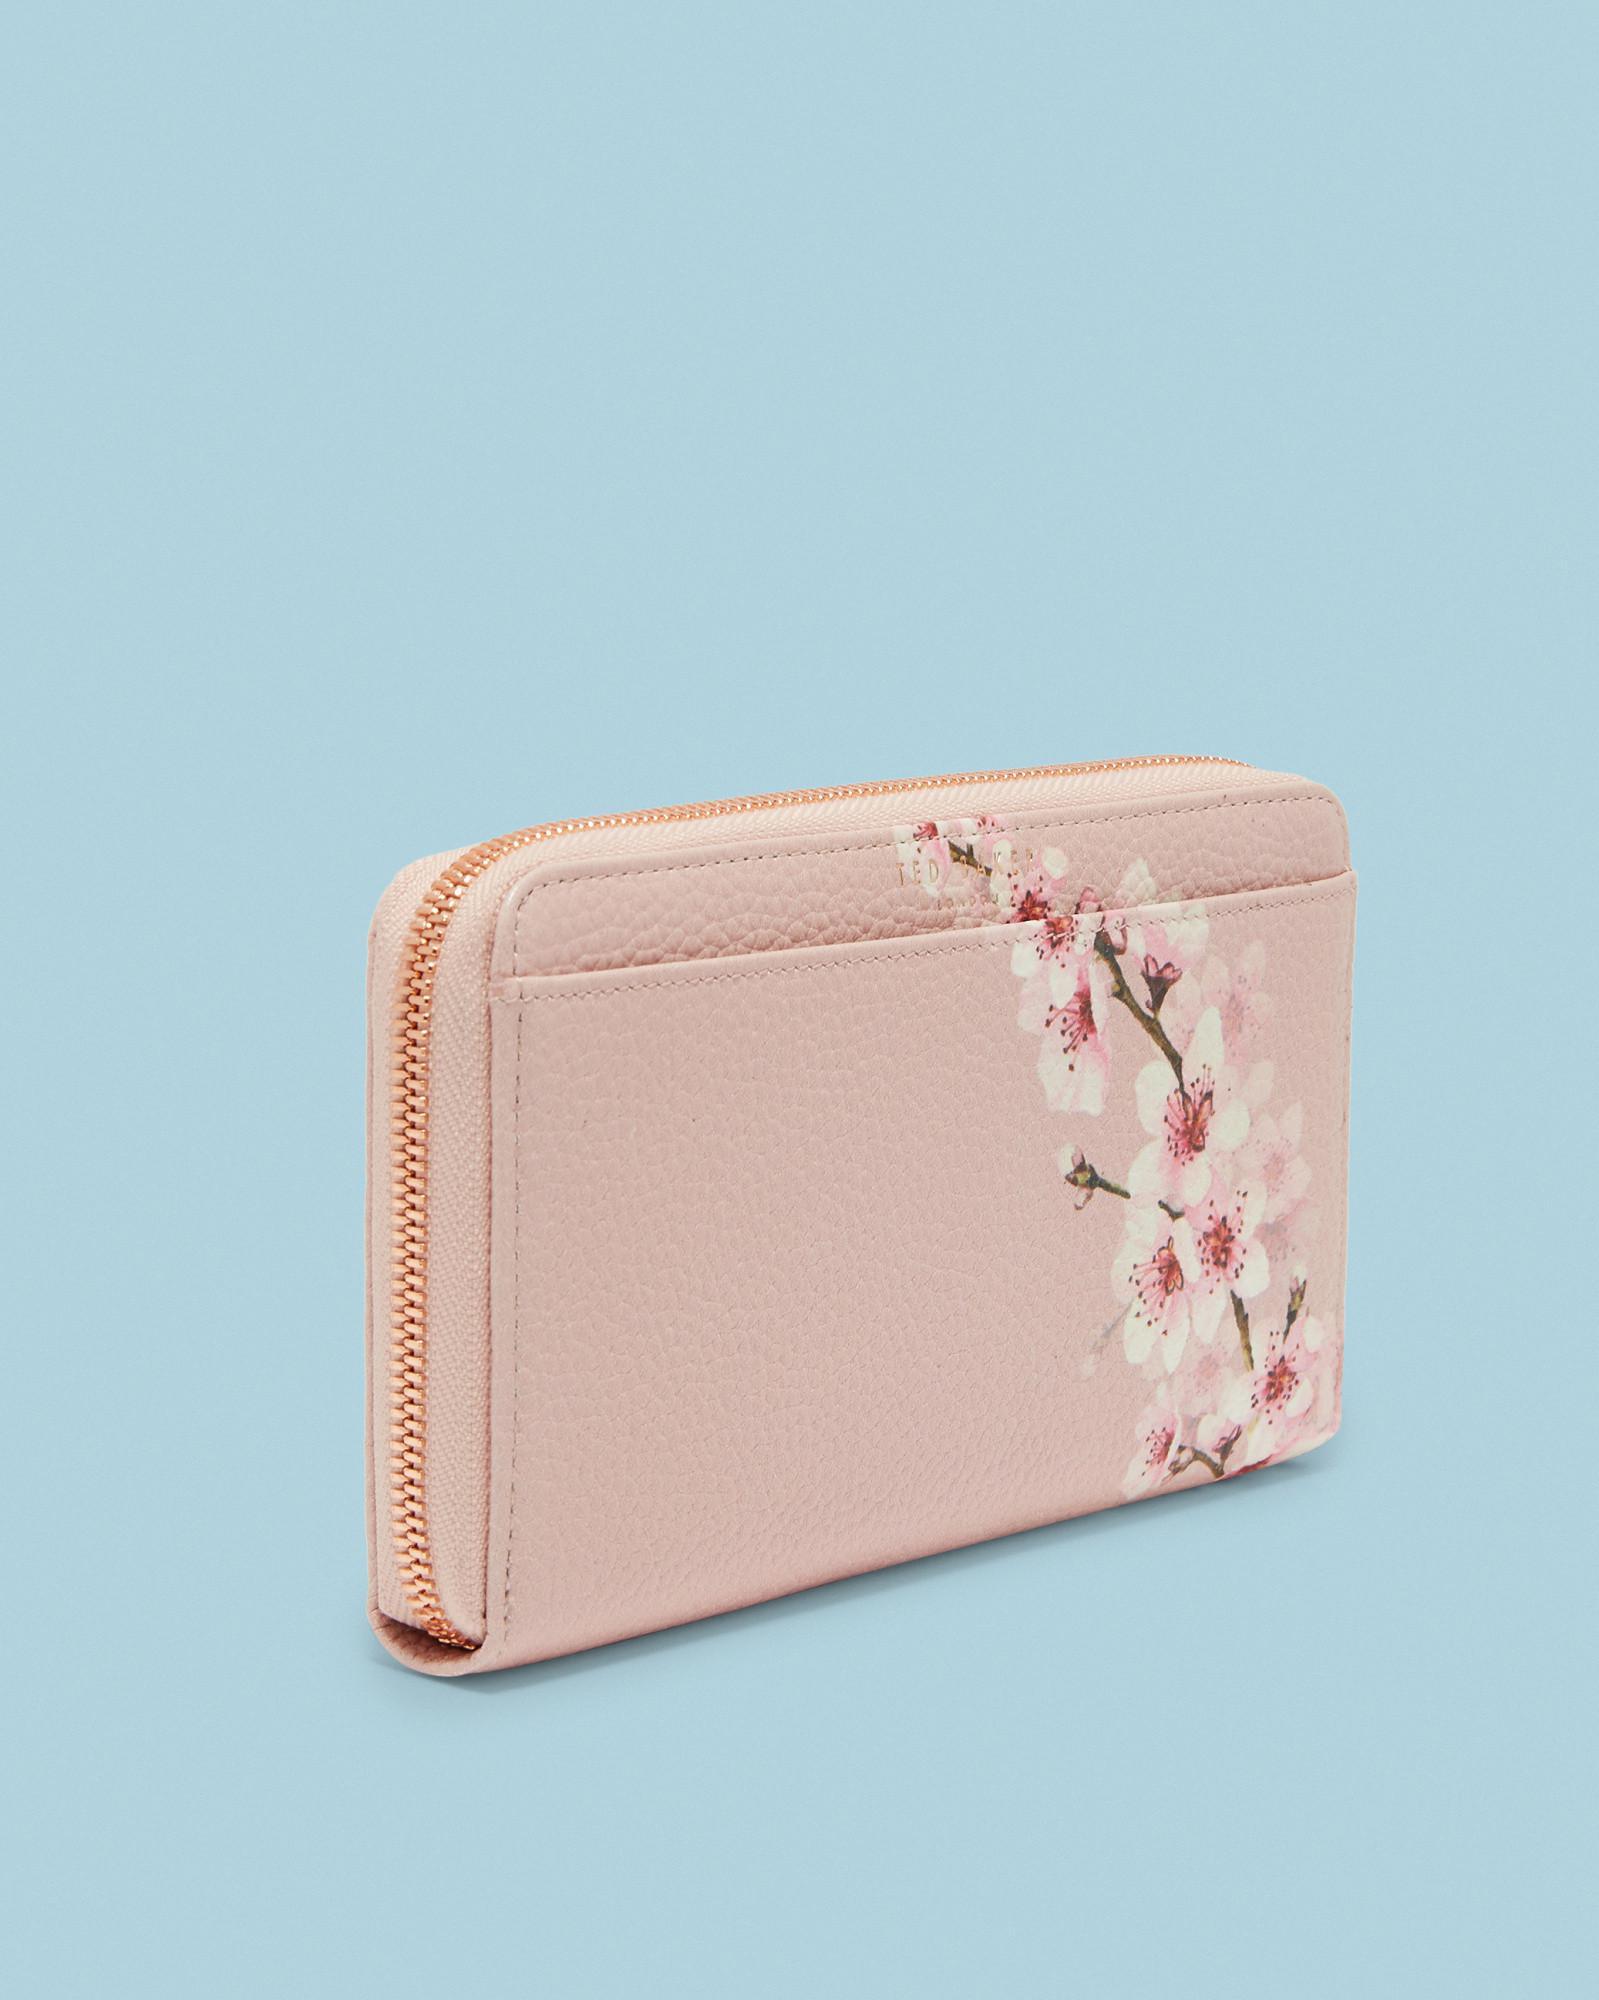 063a18013899 House Of Fraser Handbags Ted Baker - Style Guru  Fashion